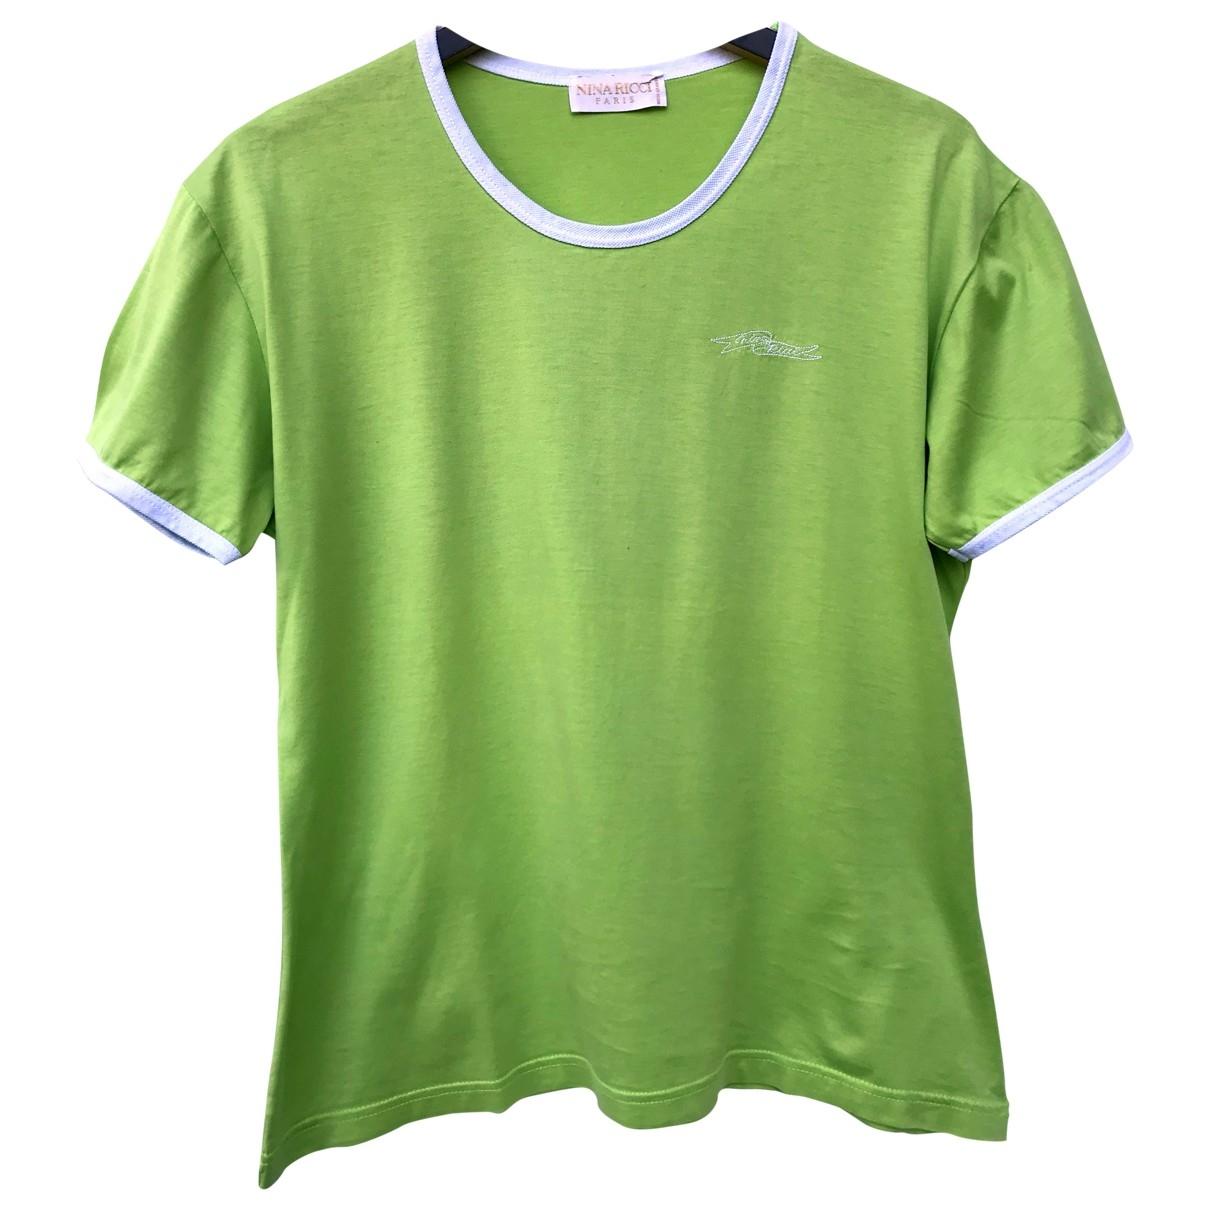 Nina Ricci - Top   pour femme en coton - vert